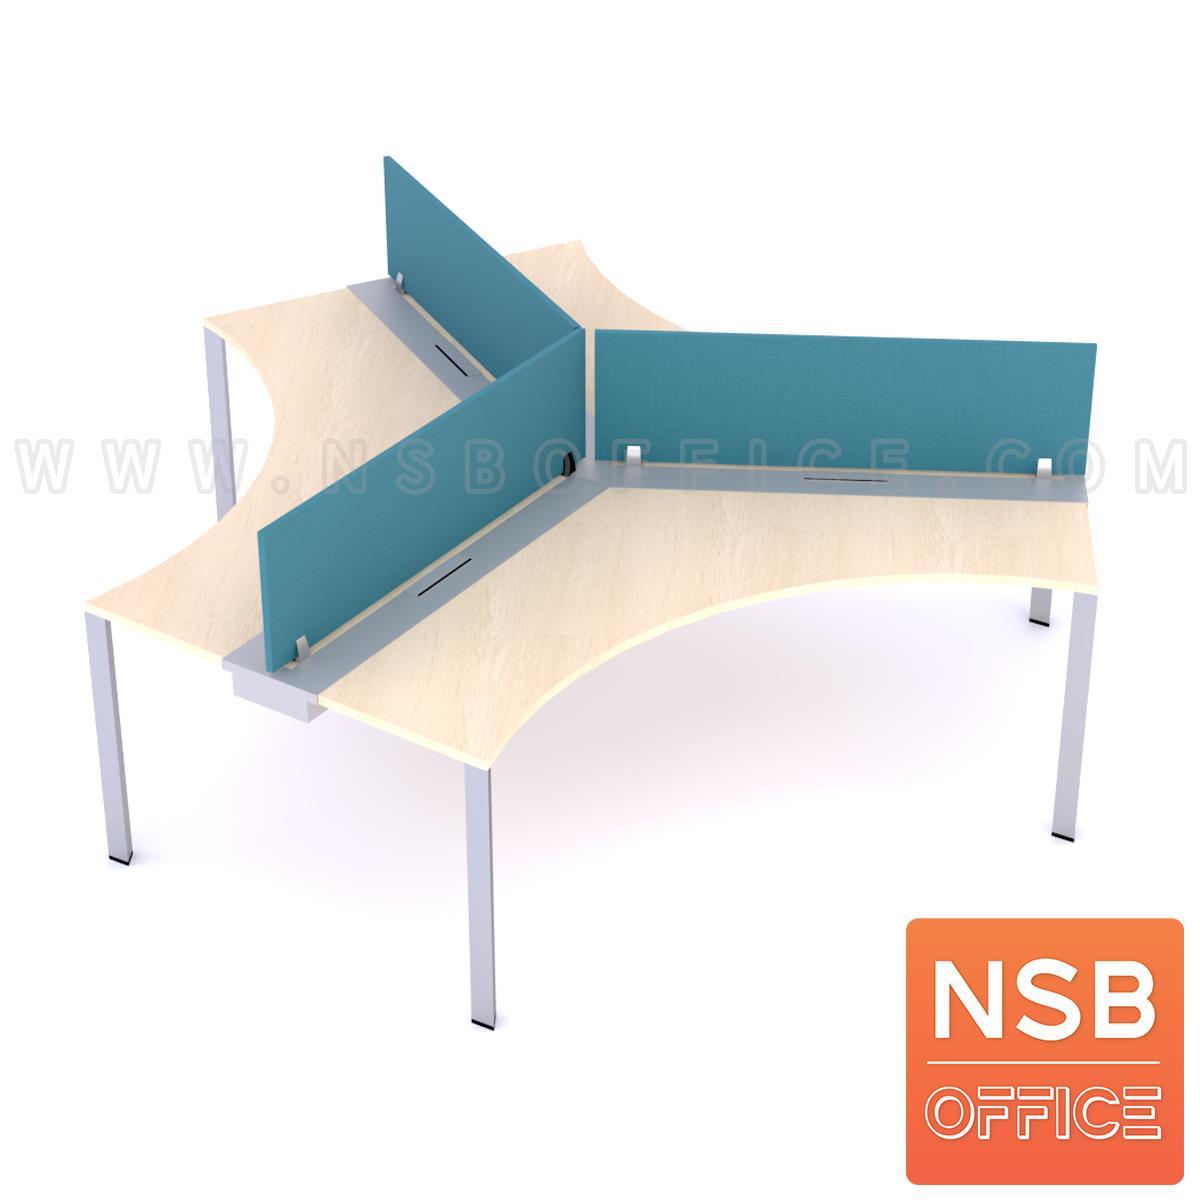 A27A057:โต๊ะทำงานกลุ่ม 3 ที่นั่ง รุ่น Lainey (เลนนี)  ขาเหล็กเหลี่ยม